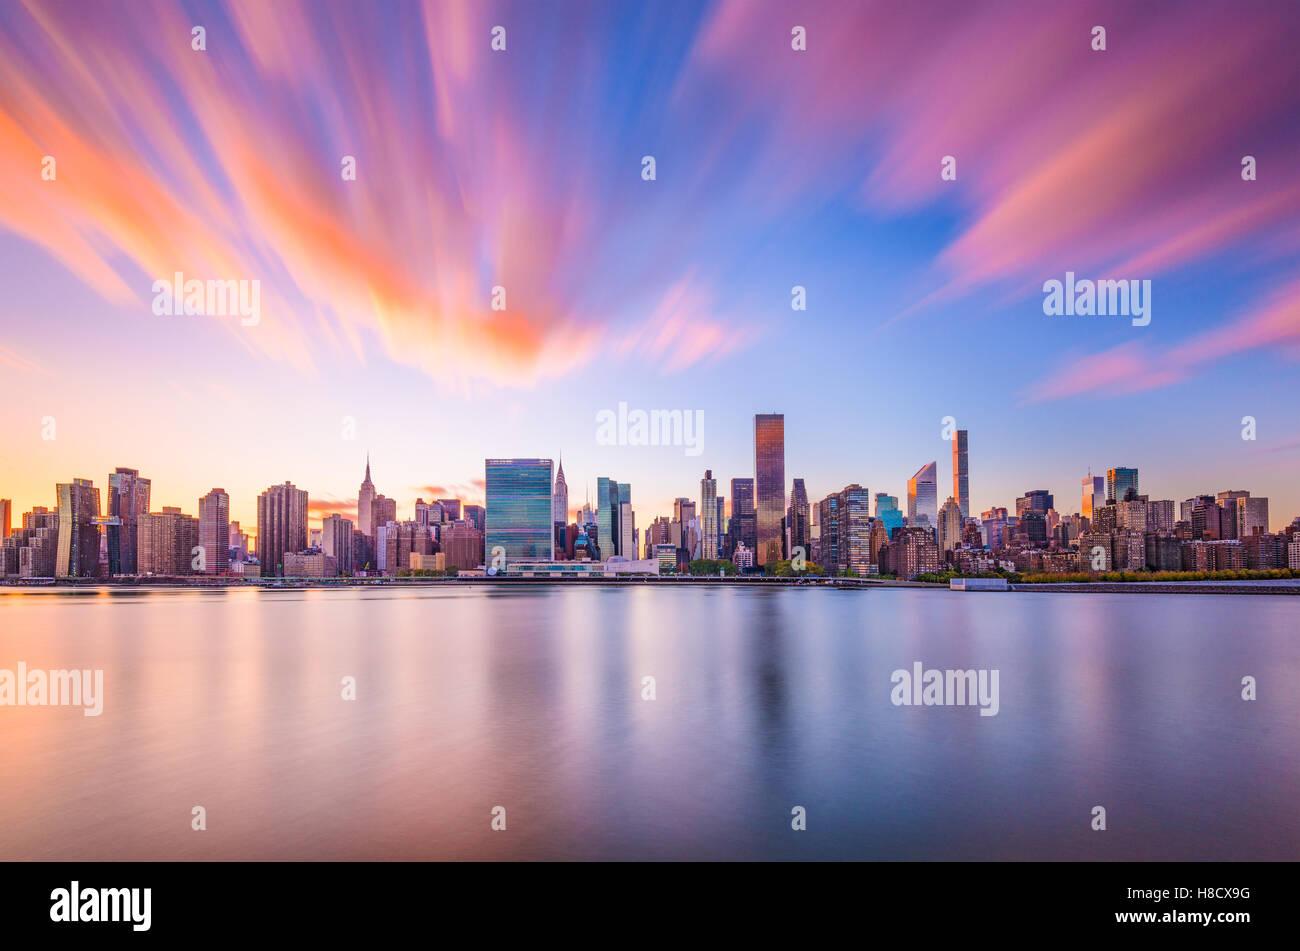 Skyline von New York City. Stockbild